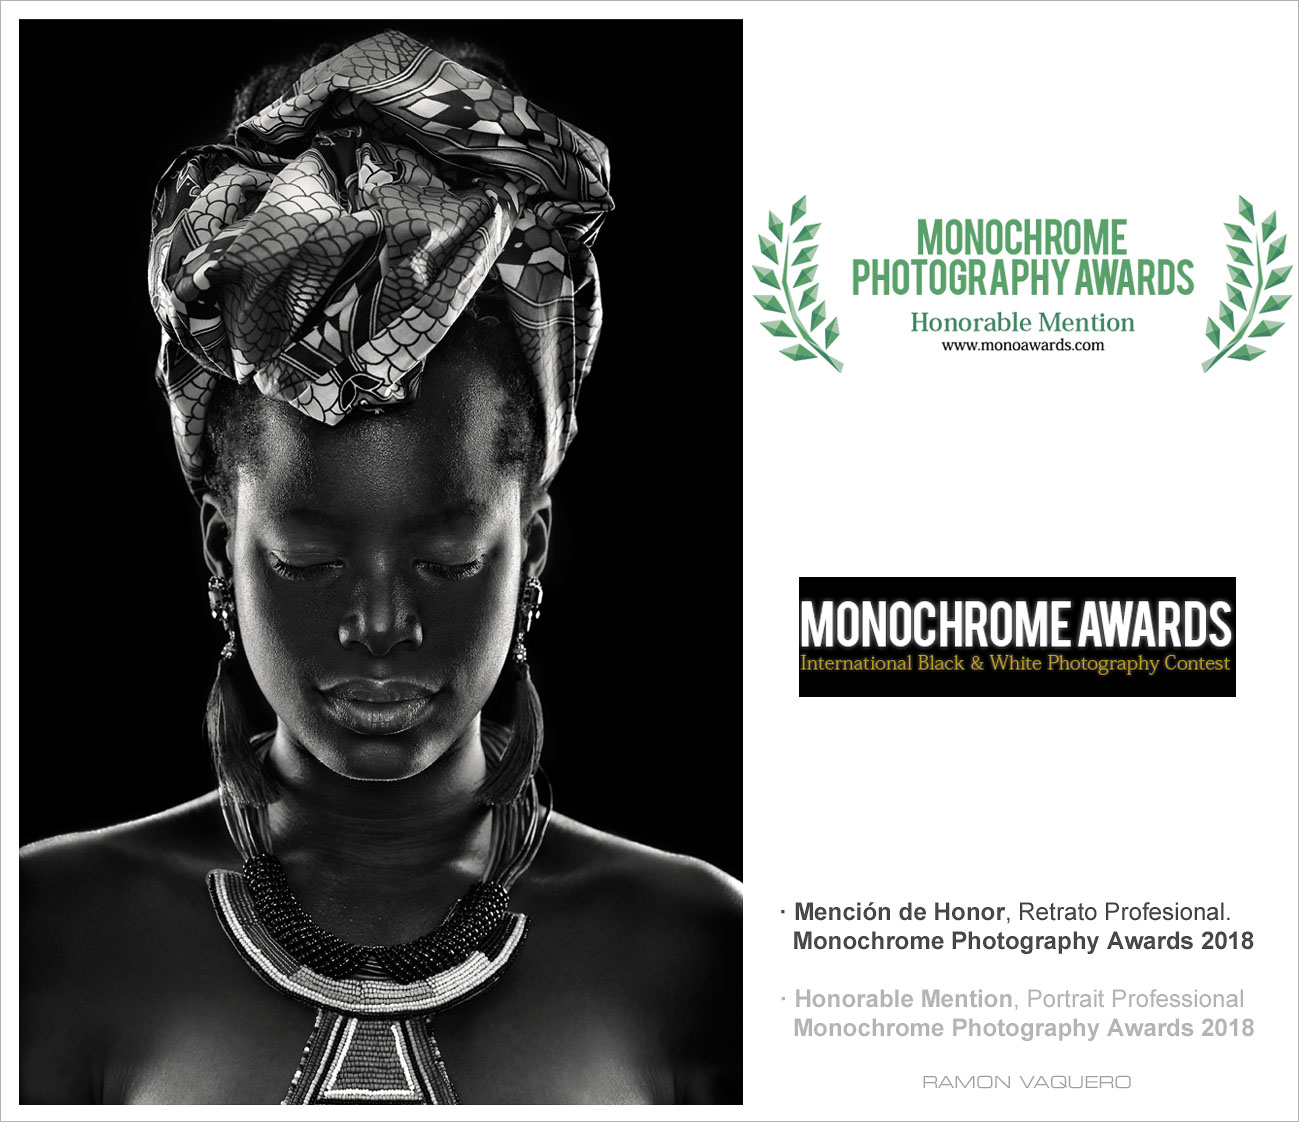 portrait_ramonvaquero_monochrome_awards_publicidad_fotografos_vigo_españa_blog